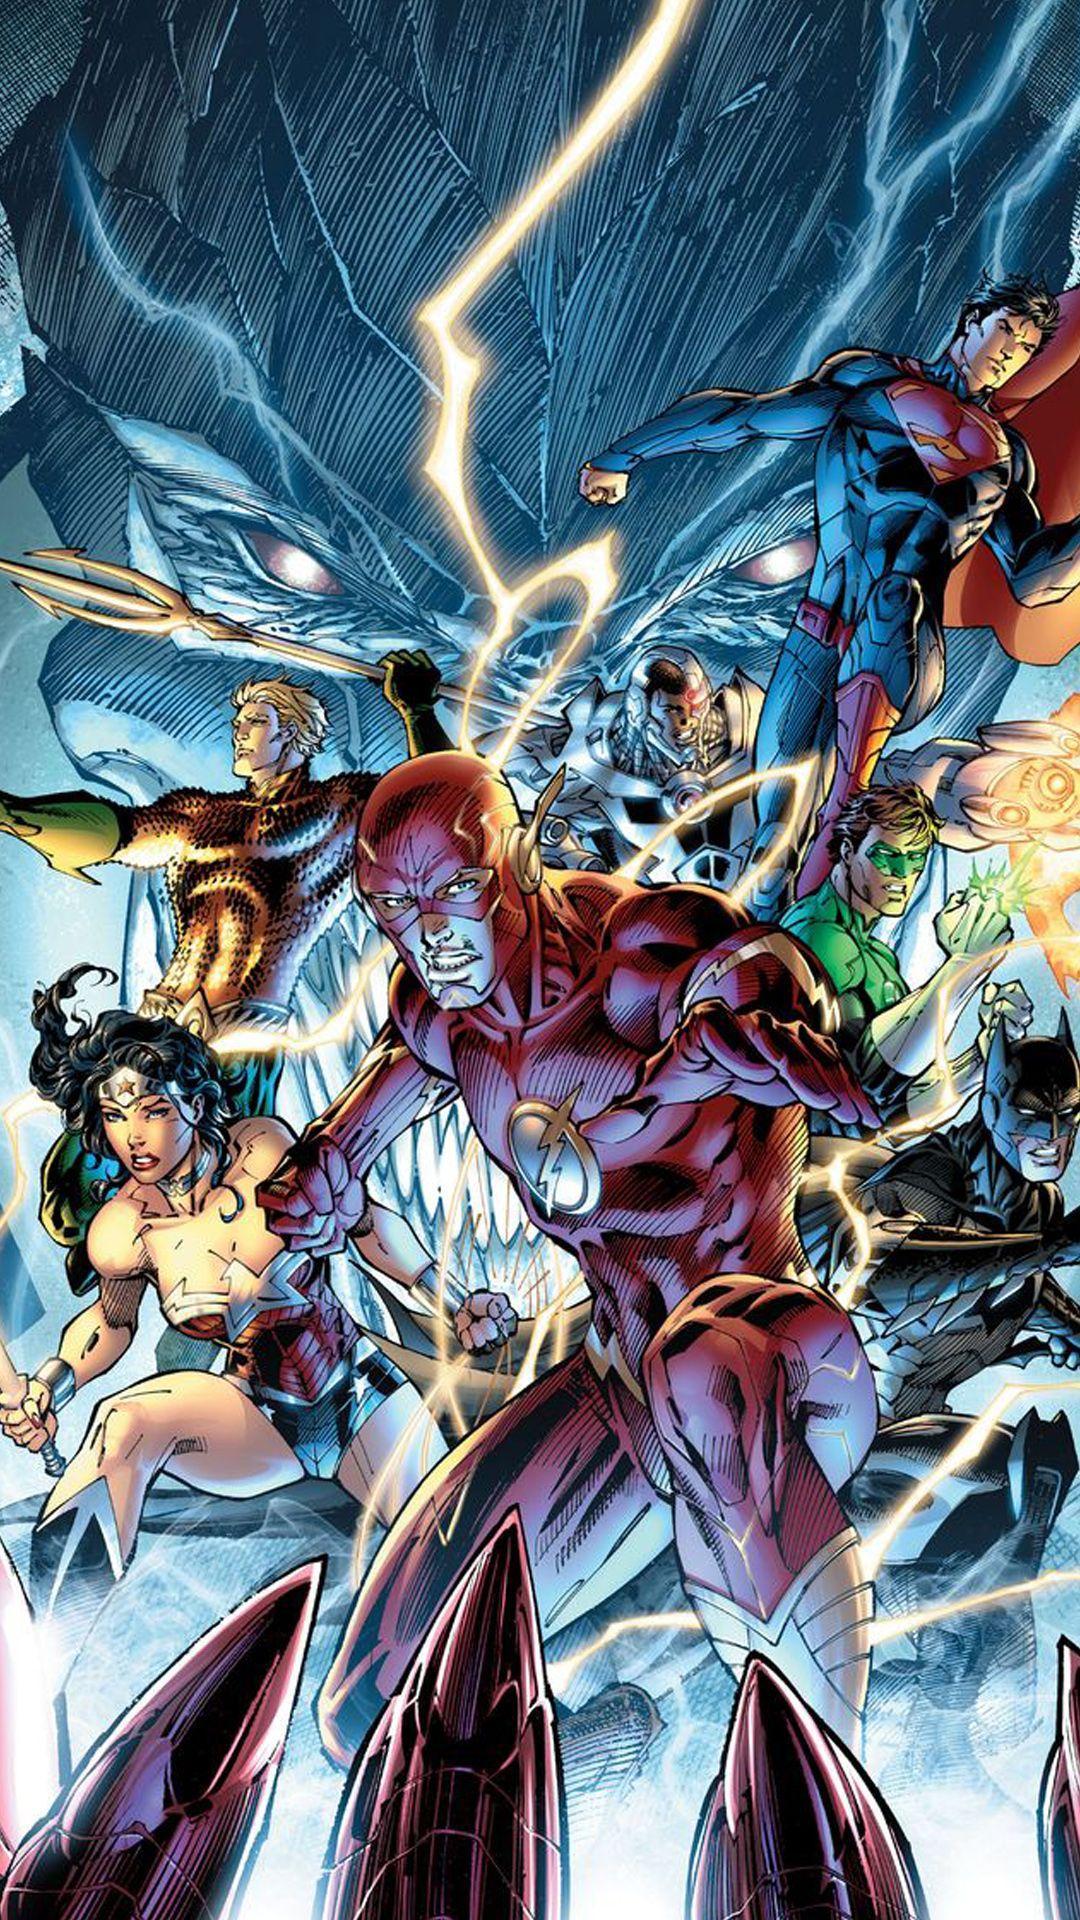 1920x1080 Justice League New 52 Wallpaper Full Hd Cinema 1080p